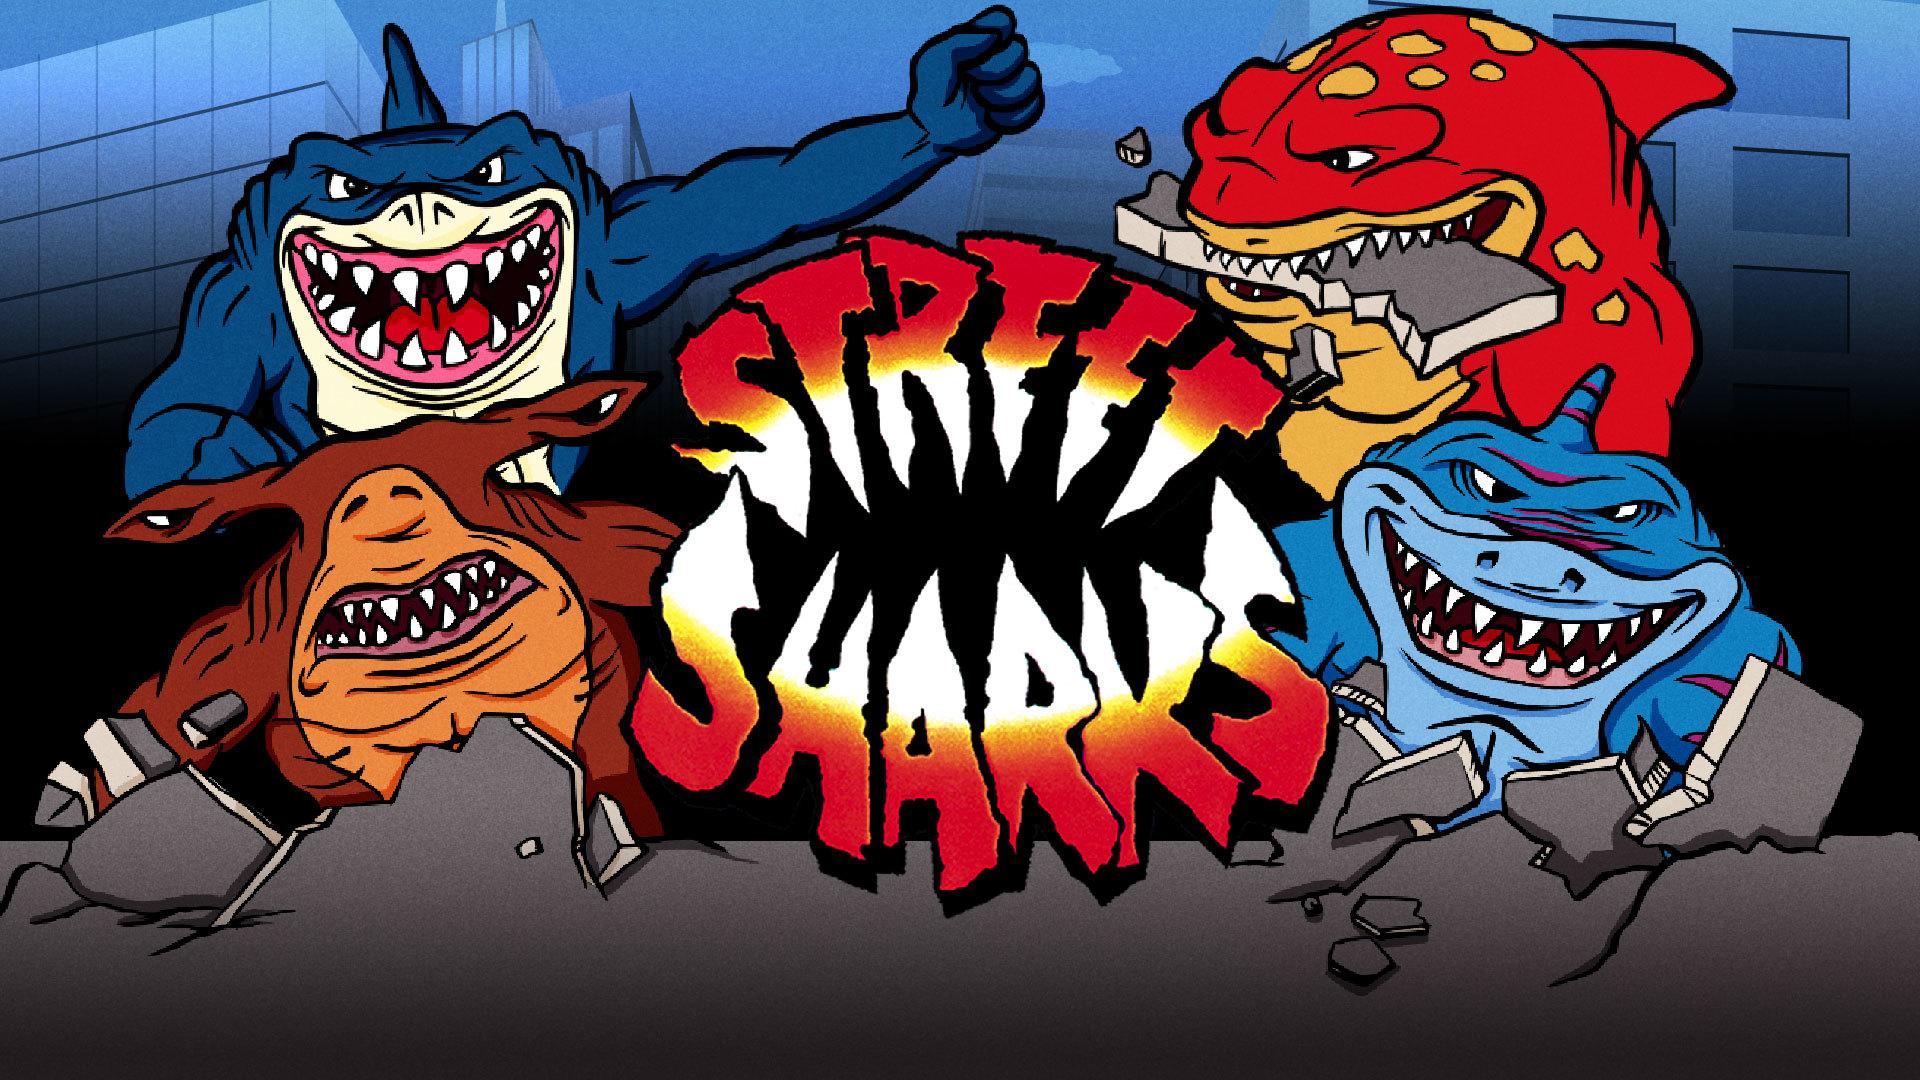 Street Sharks.